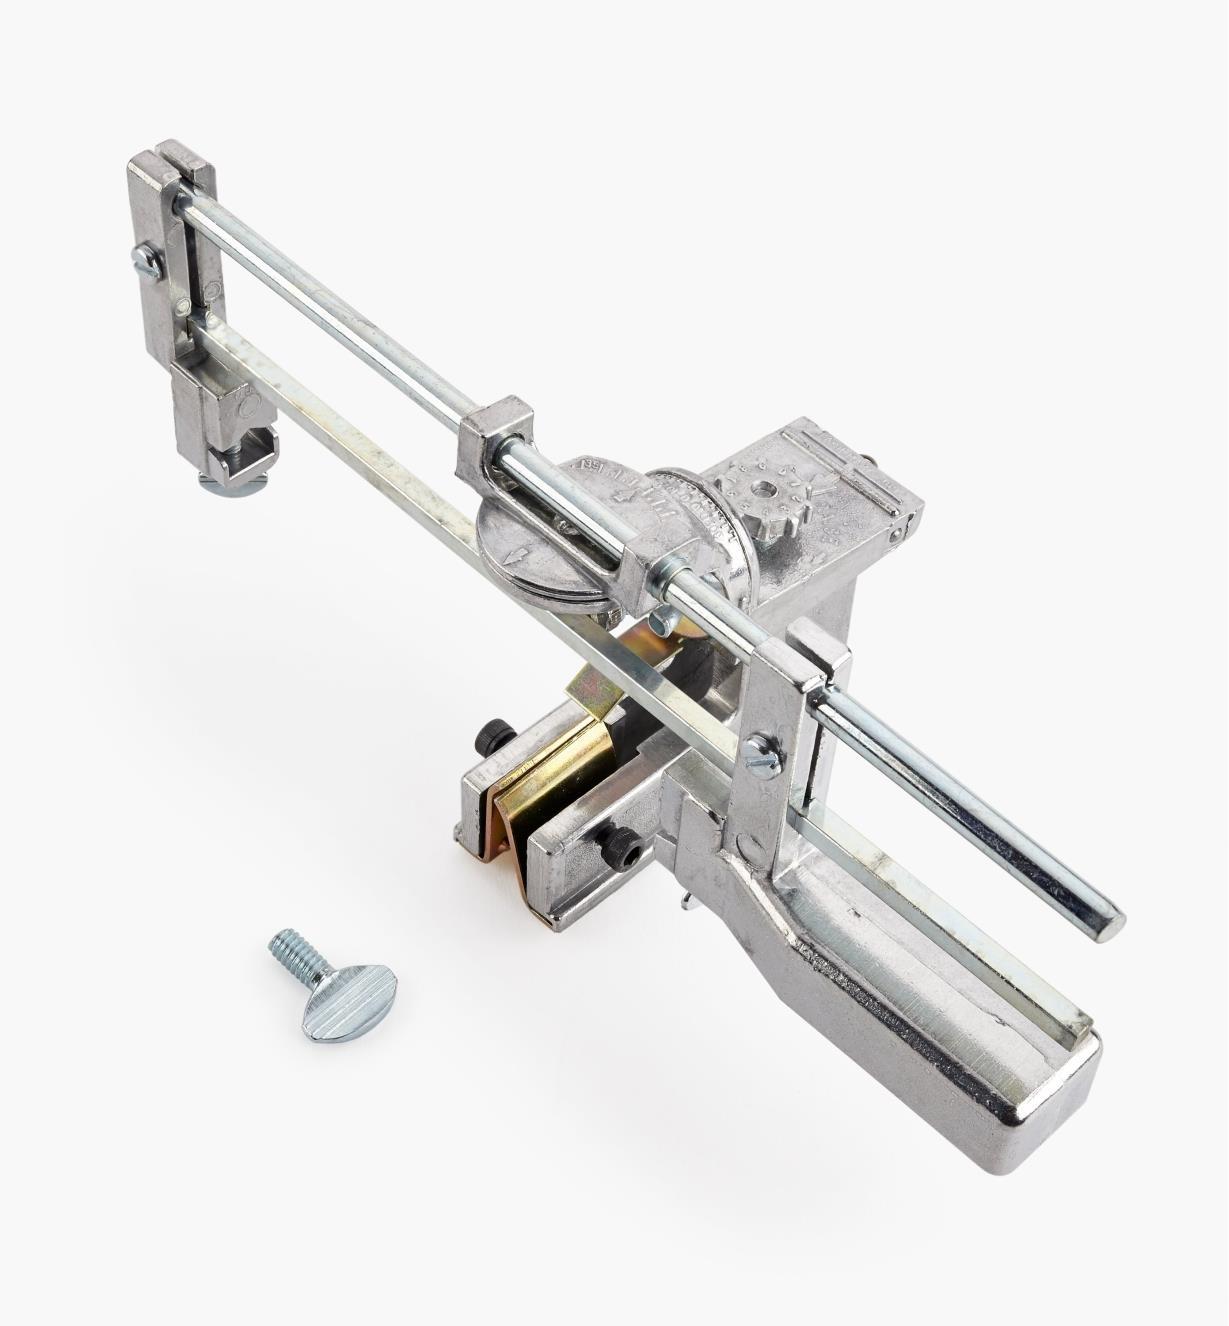 75U0330 - Deluxe Chain-Saw Sharpener